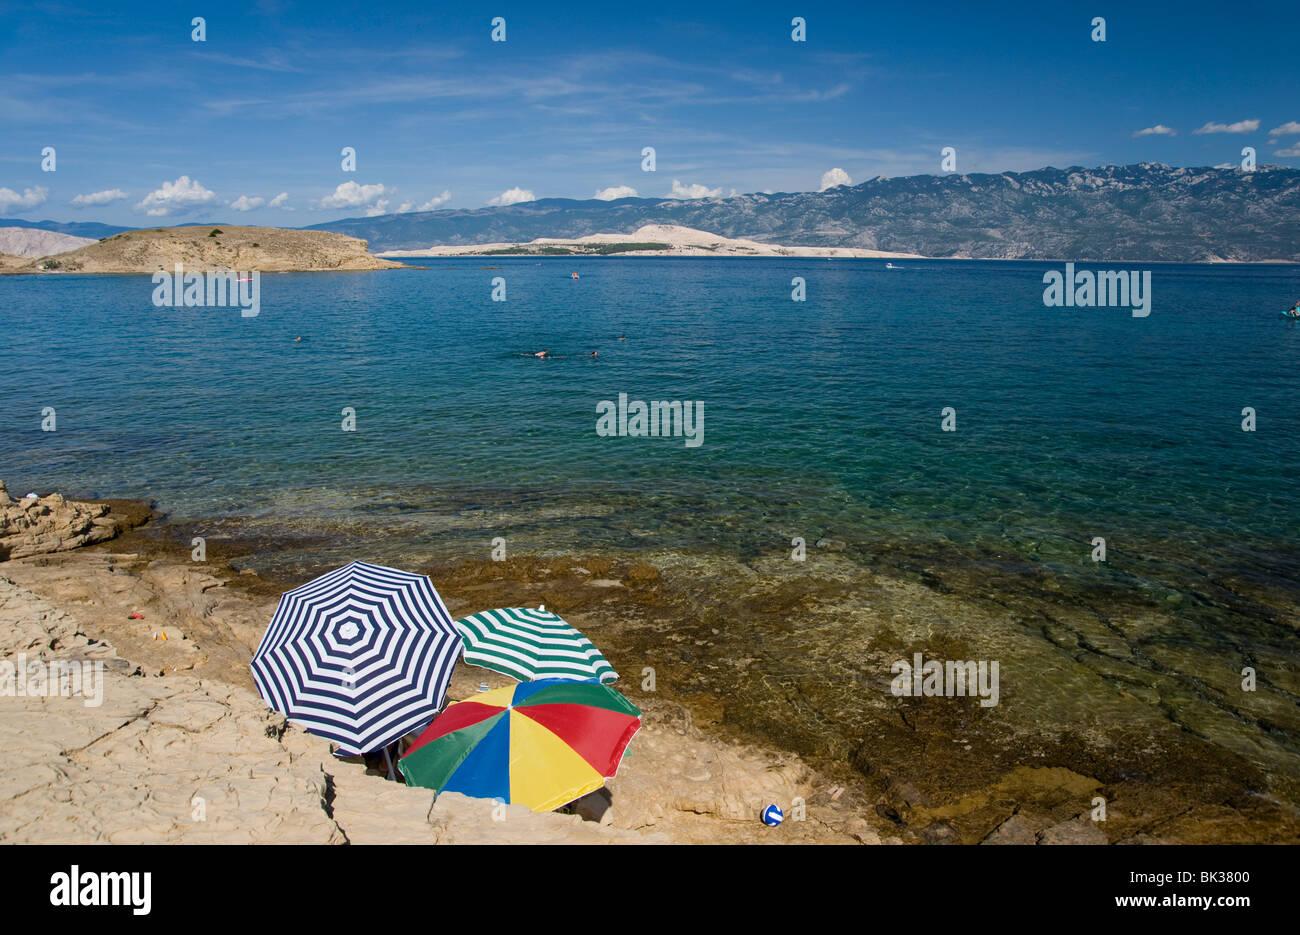 Sonnenschirme am Meer bei San Marino, Insel Rab, Kvarner Region, Kroatien, Europa Stockbild